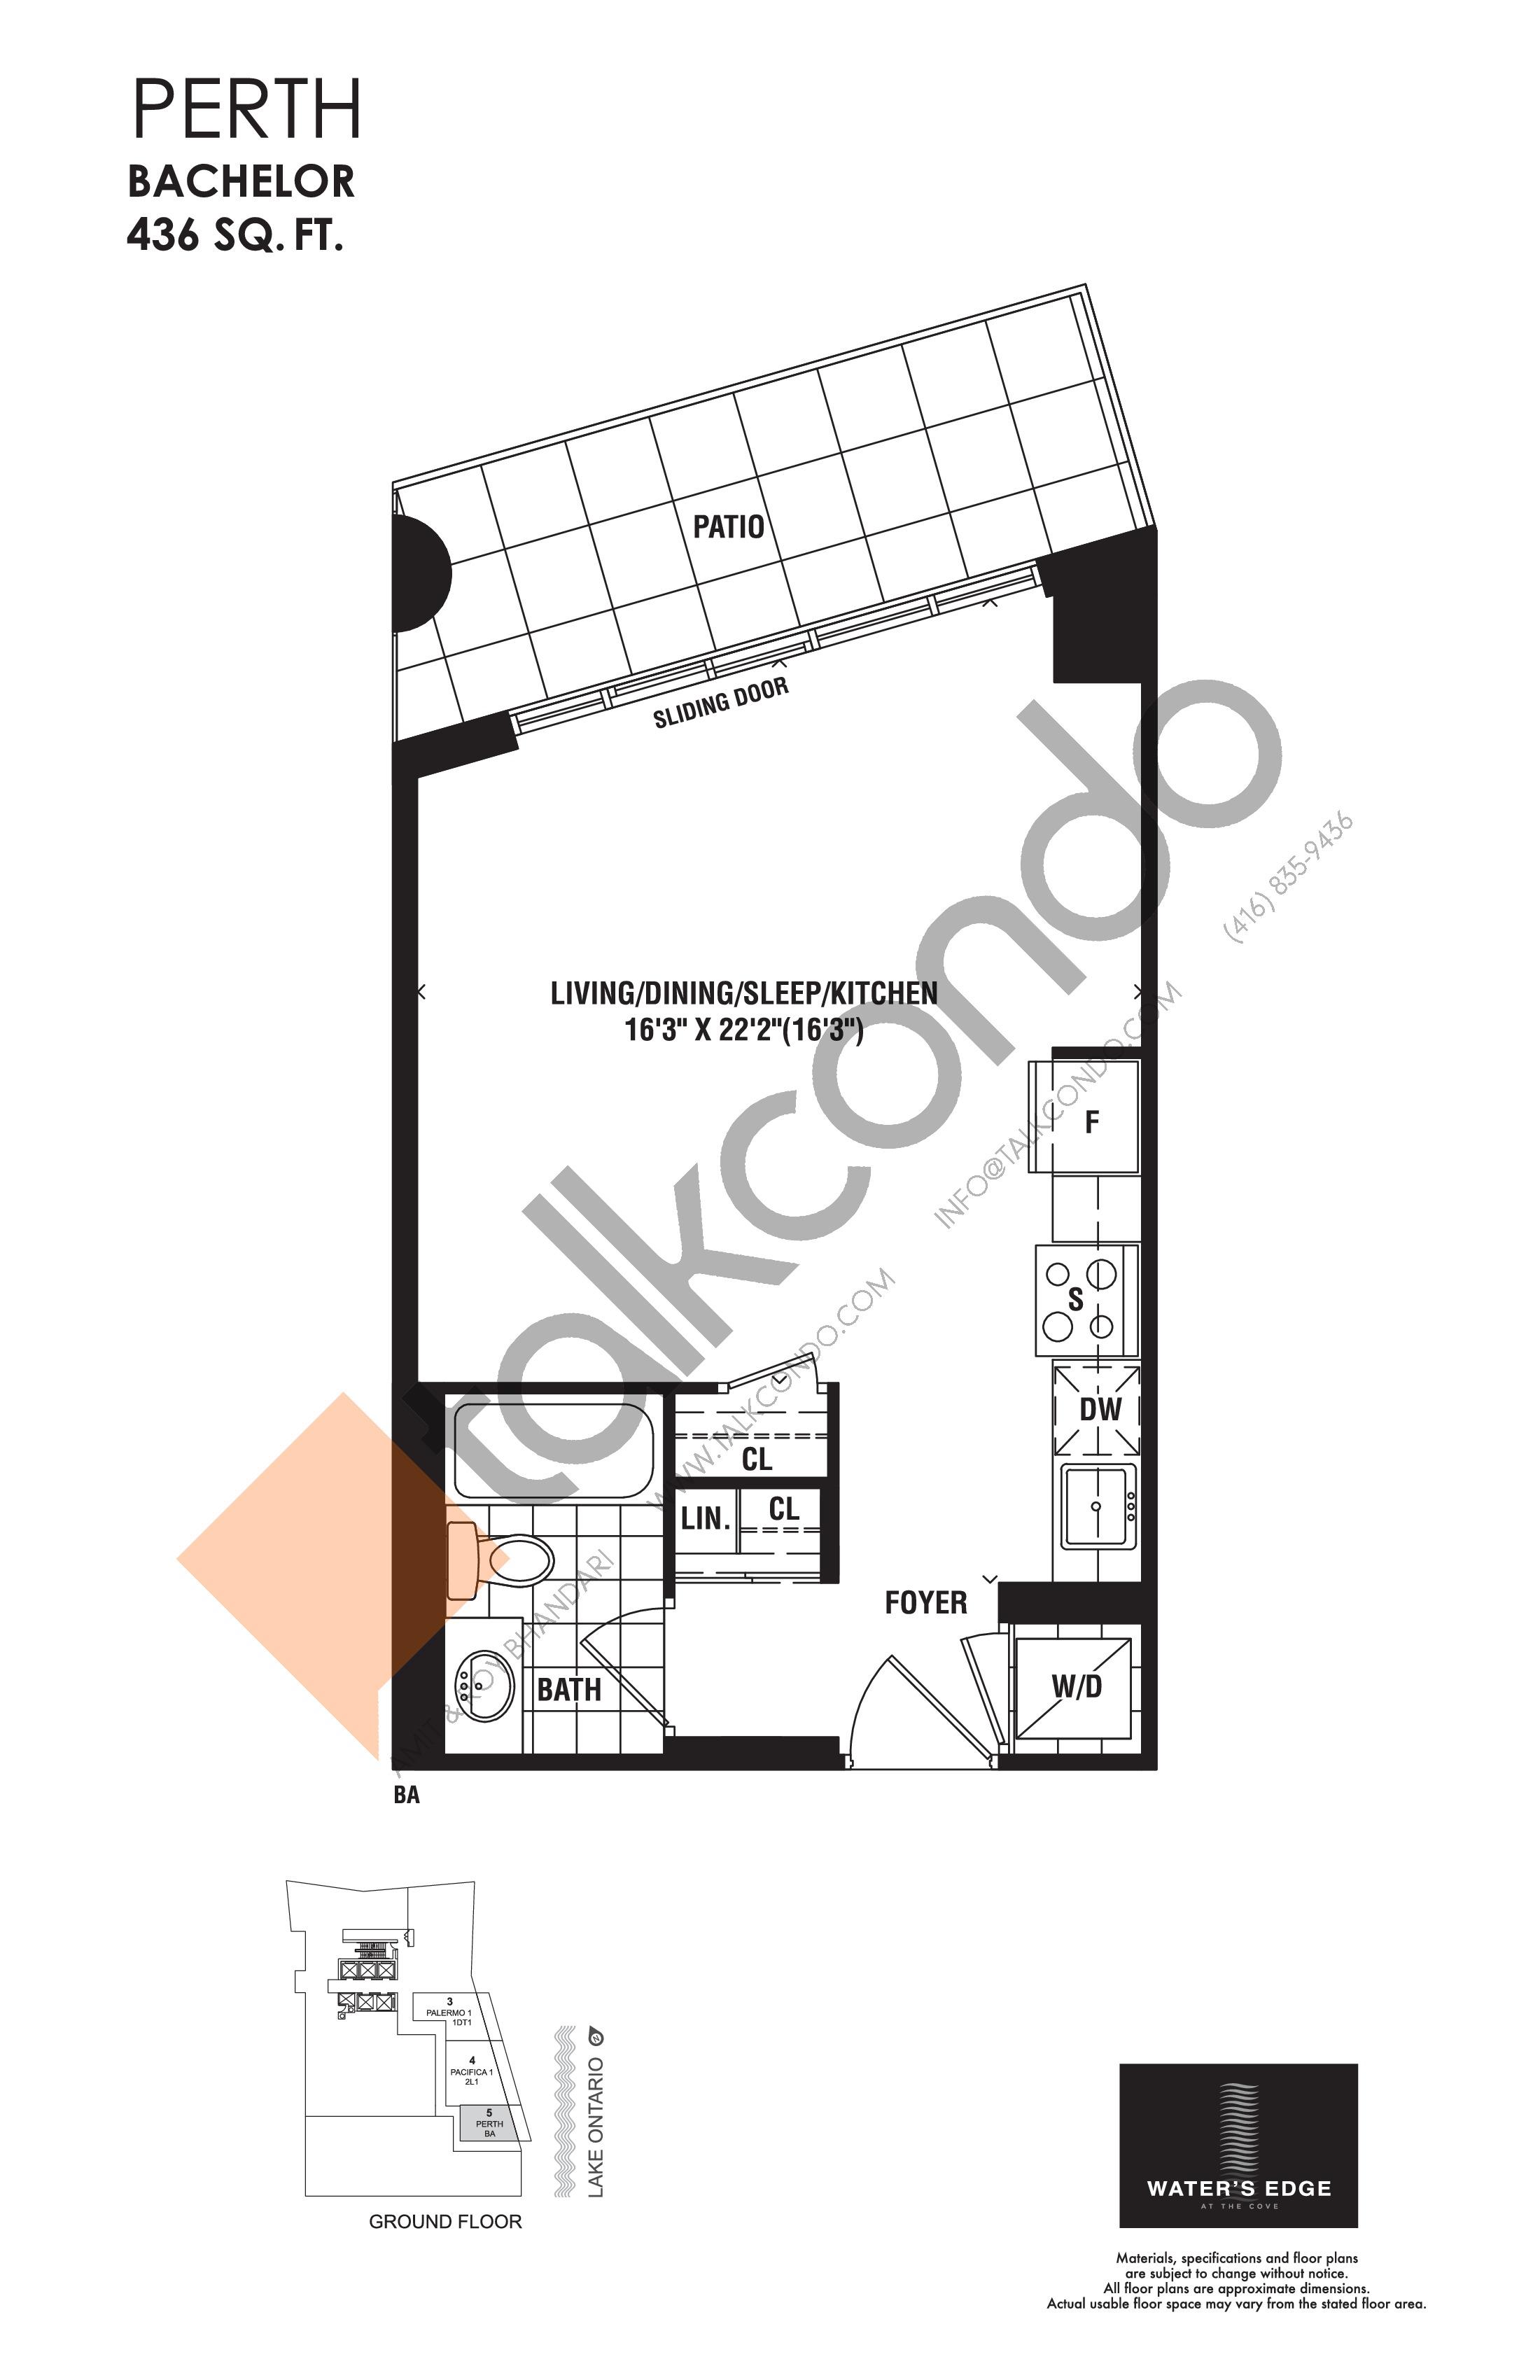 Perth Floor Plan at Water's Edge at the Cove Condos - 436 sq.ft